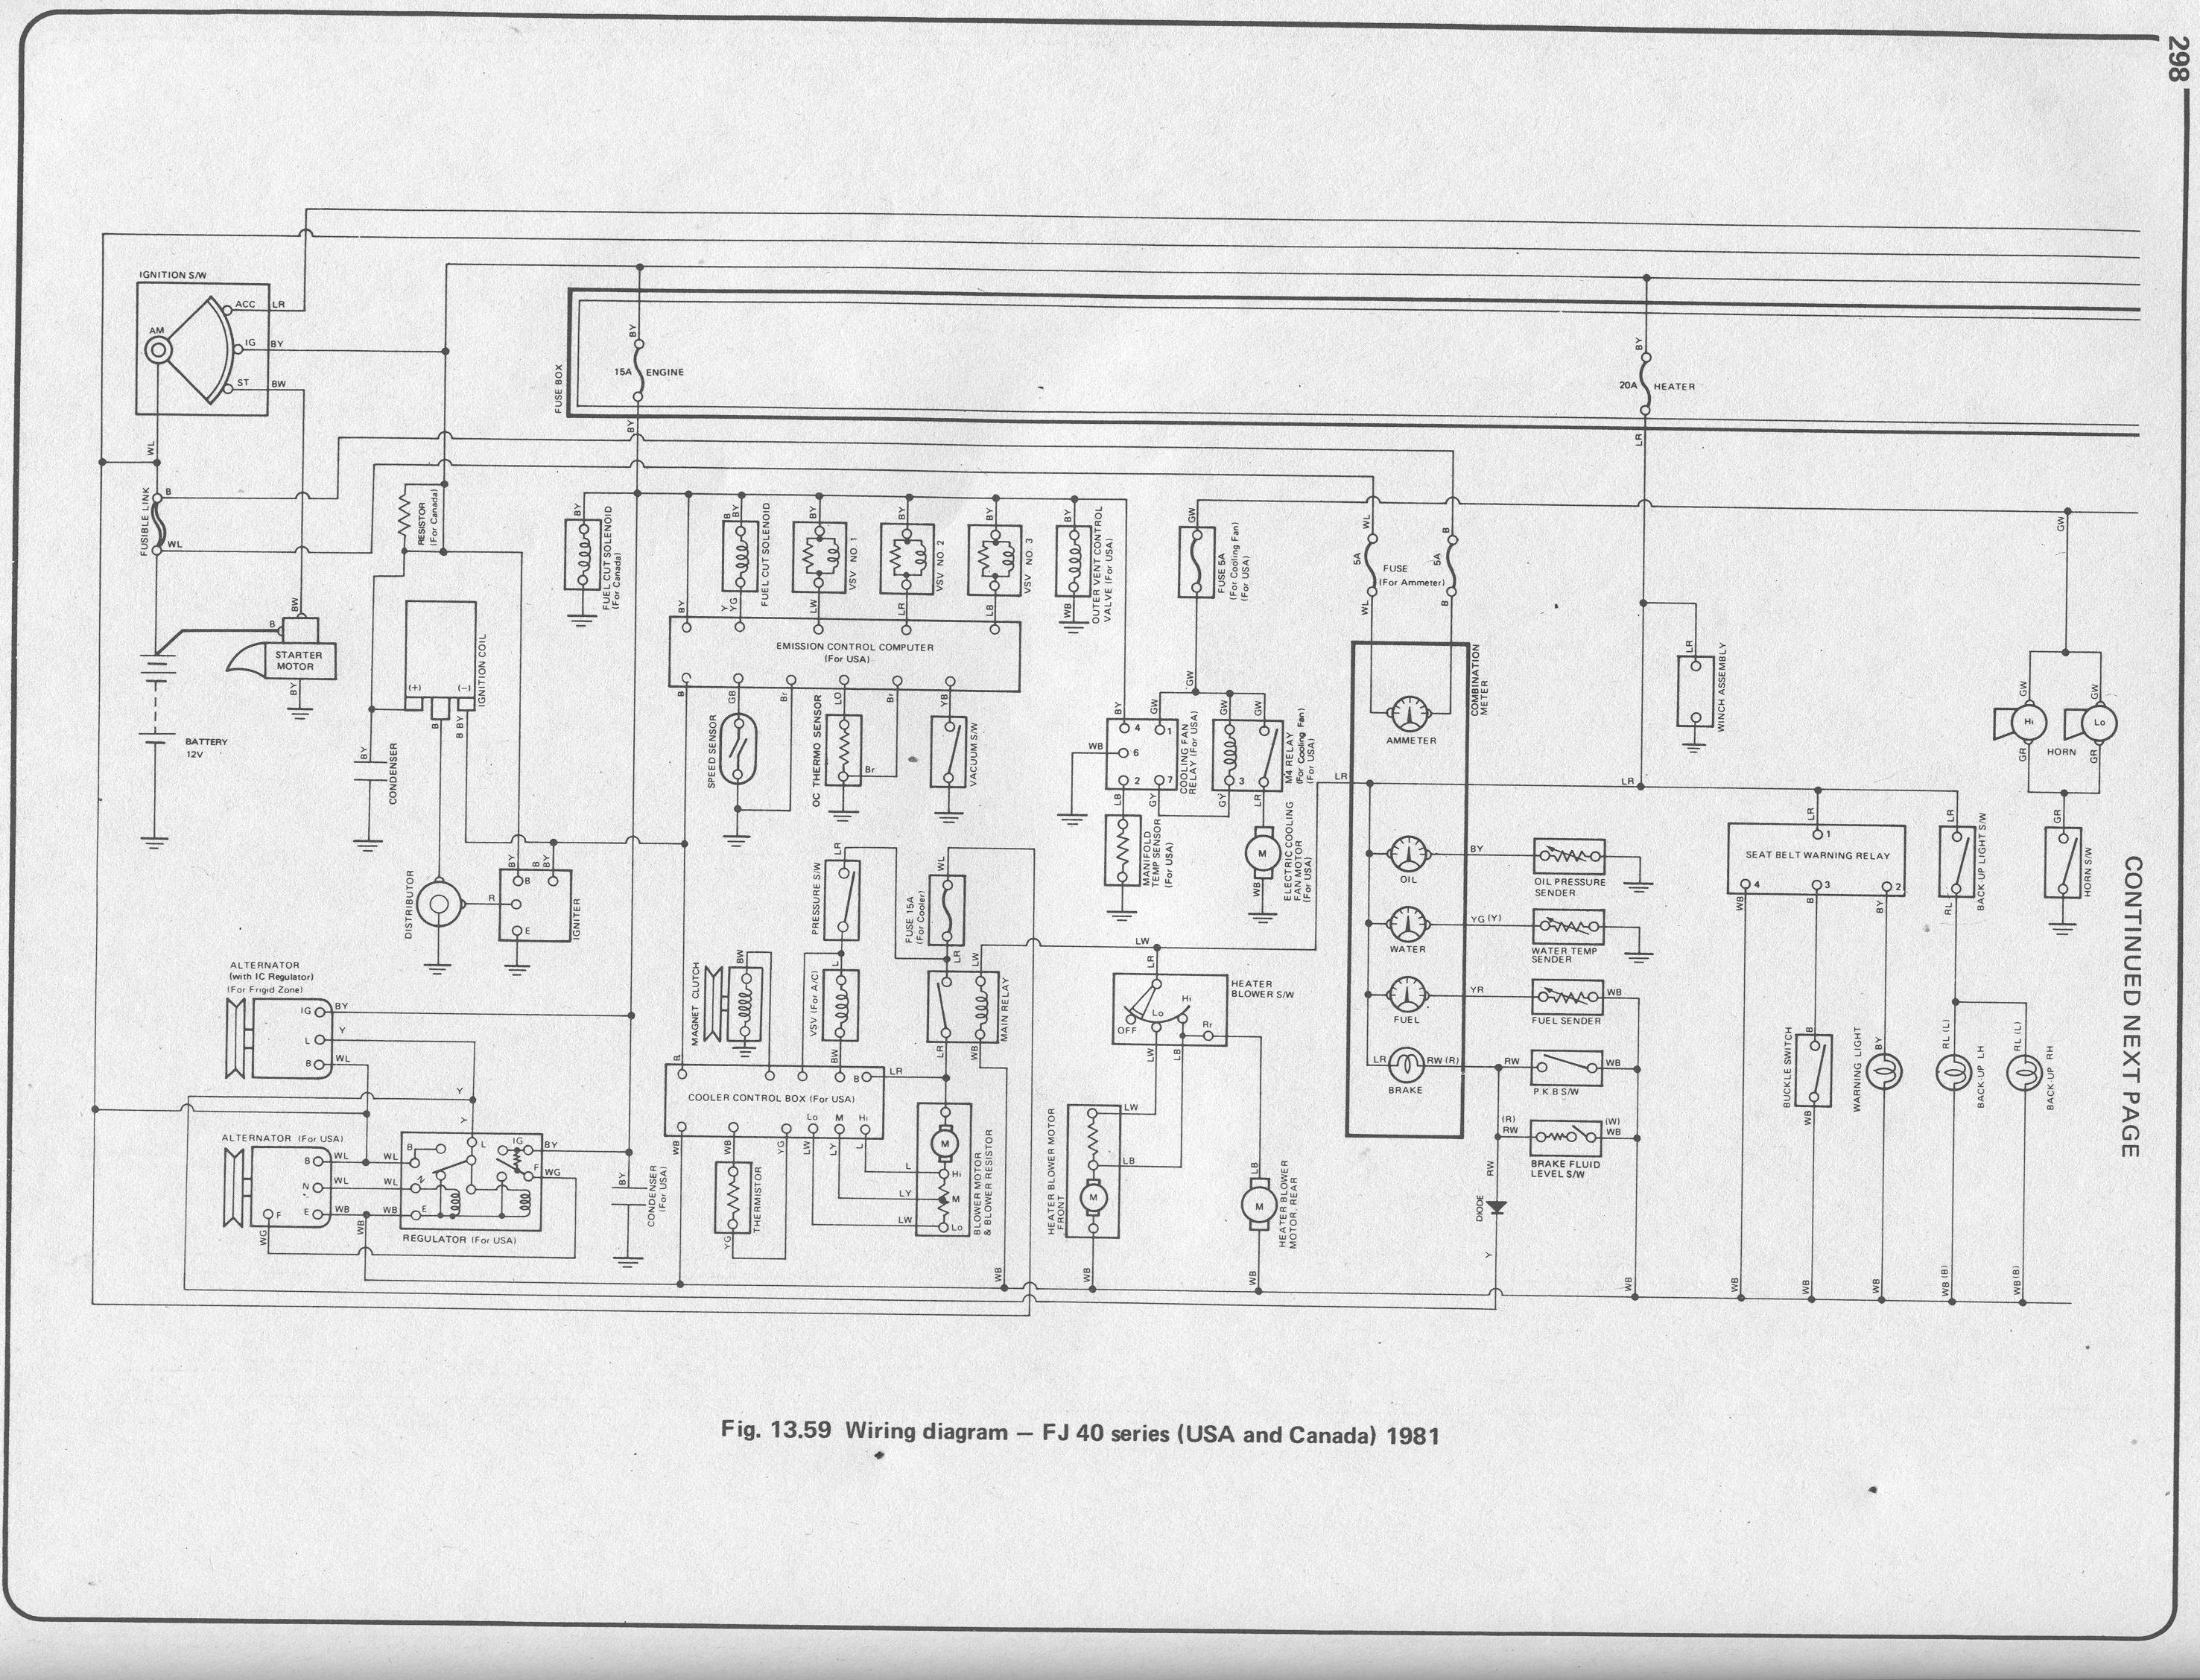 1983 Holiday Rambler Wiring Diagram - 2010 Lincoln Mks Fuse Diagram for Wiring  Diagram SchematicsWiring Diagram Schematics